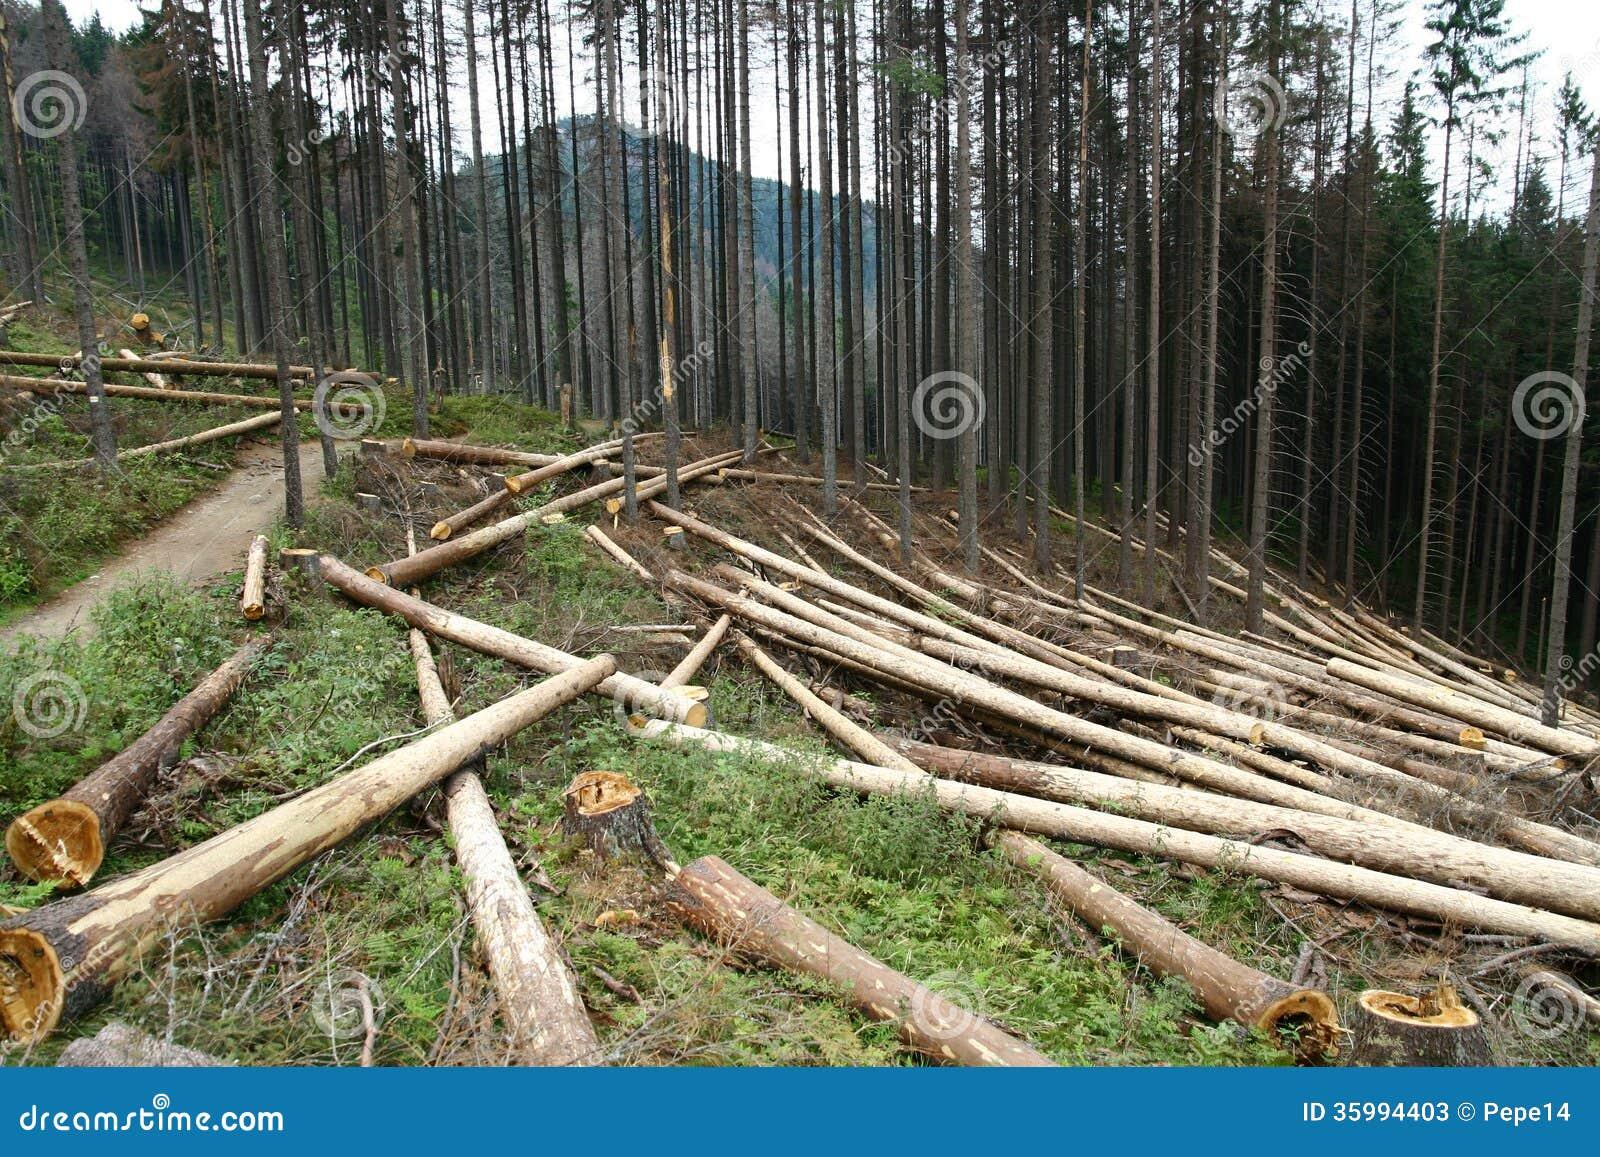 abattage du bois image stock image du slash bois coupure 35994403. Black Bedroom Furniture Sets. Home Design Ideas